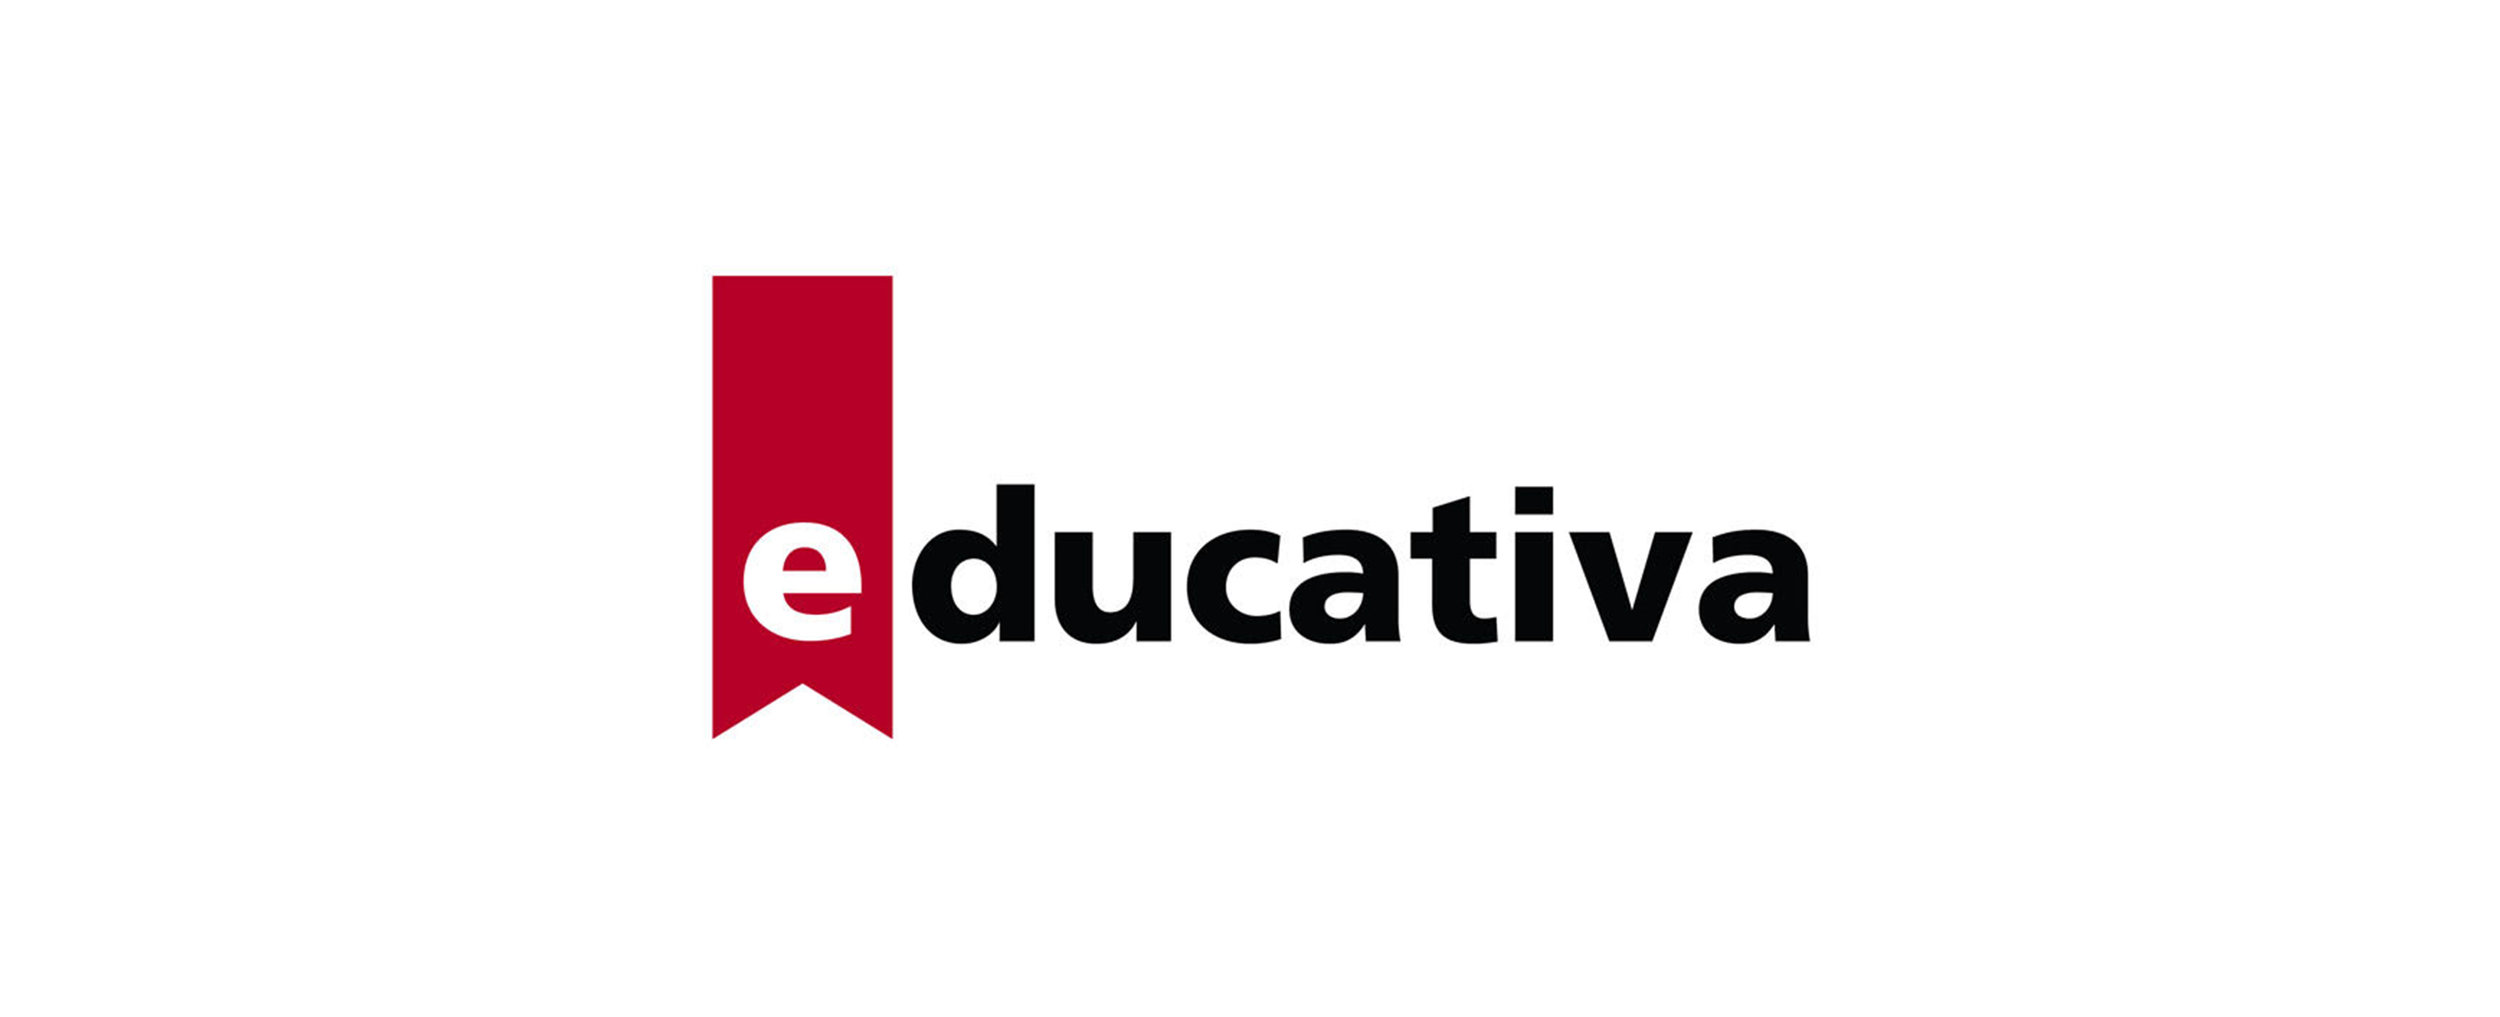 Educativa_largo.jpg